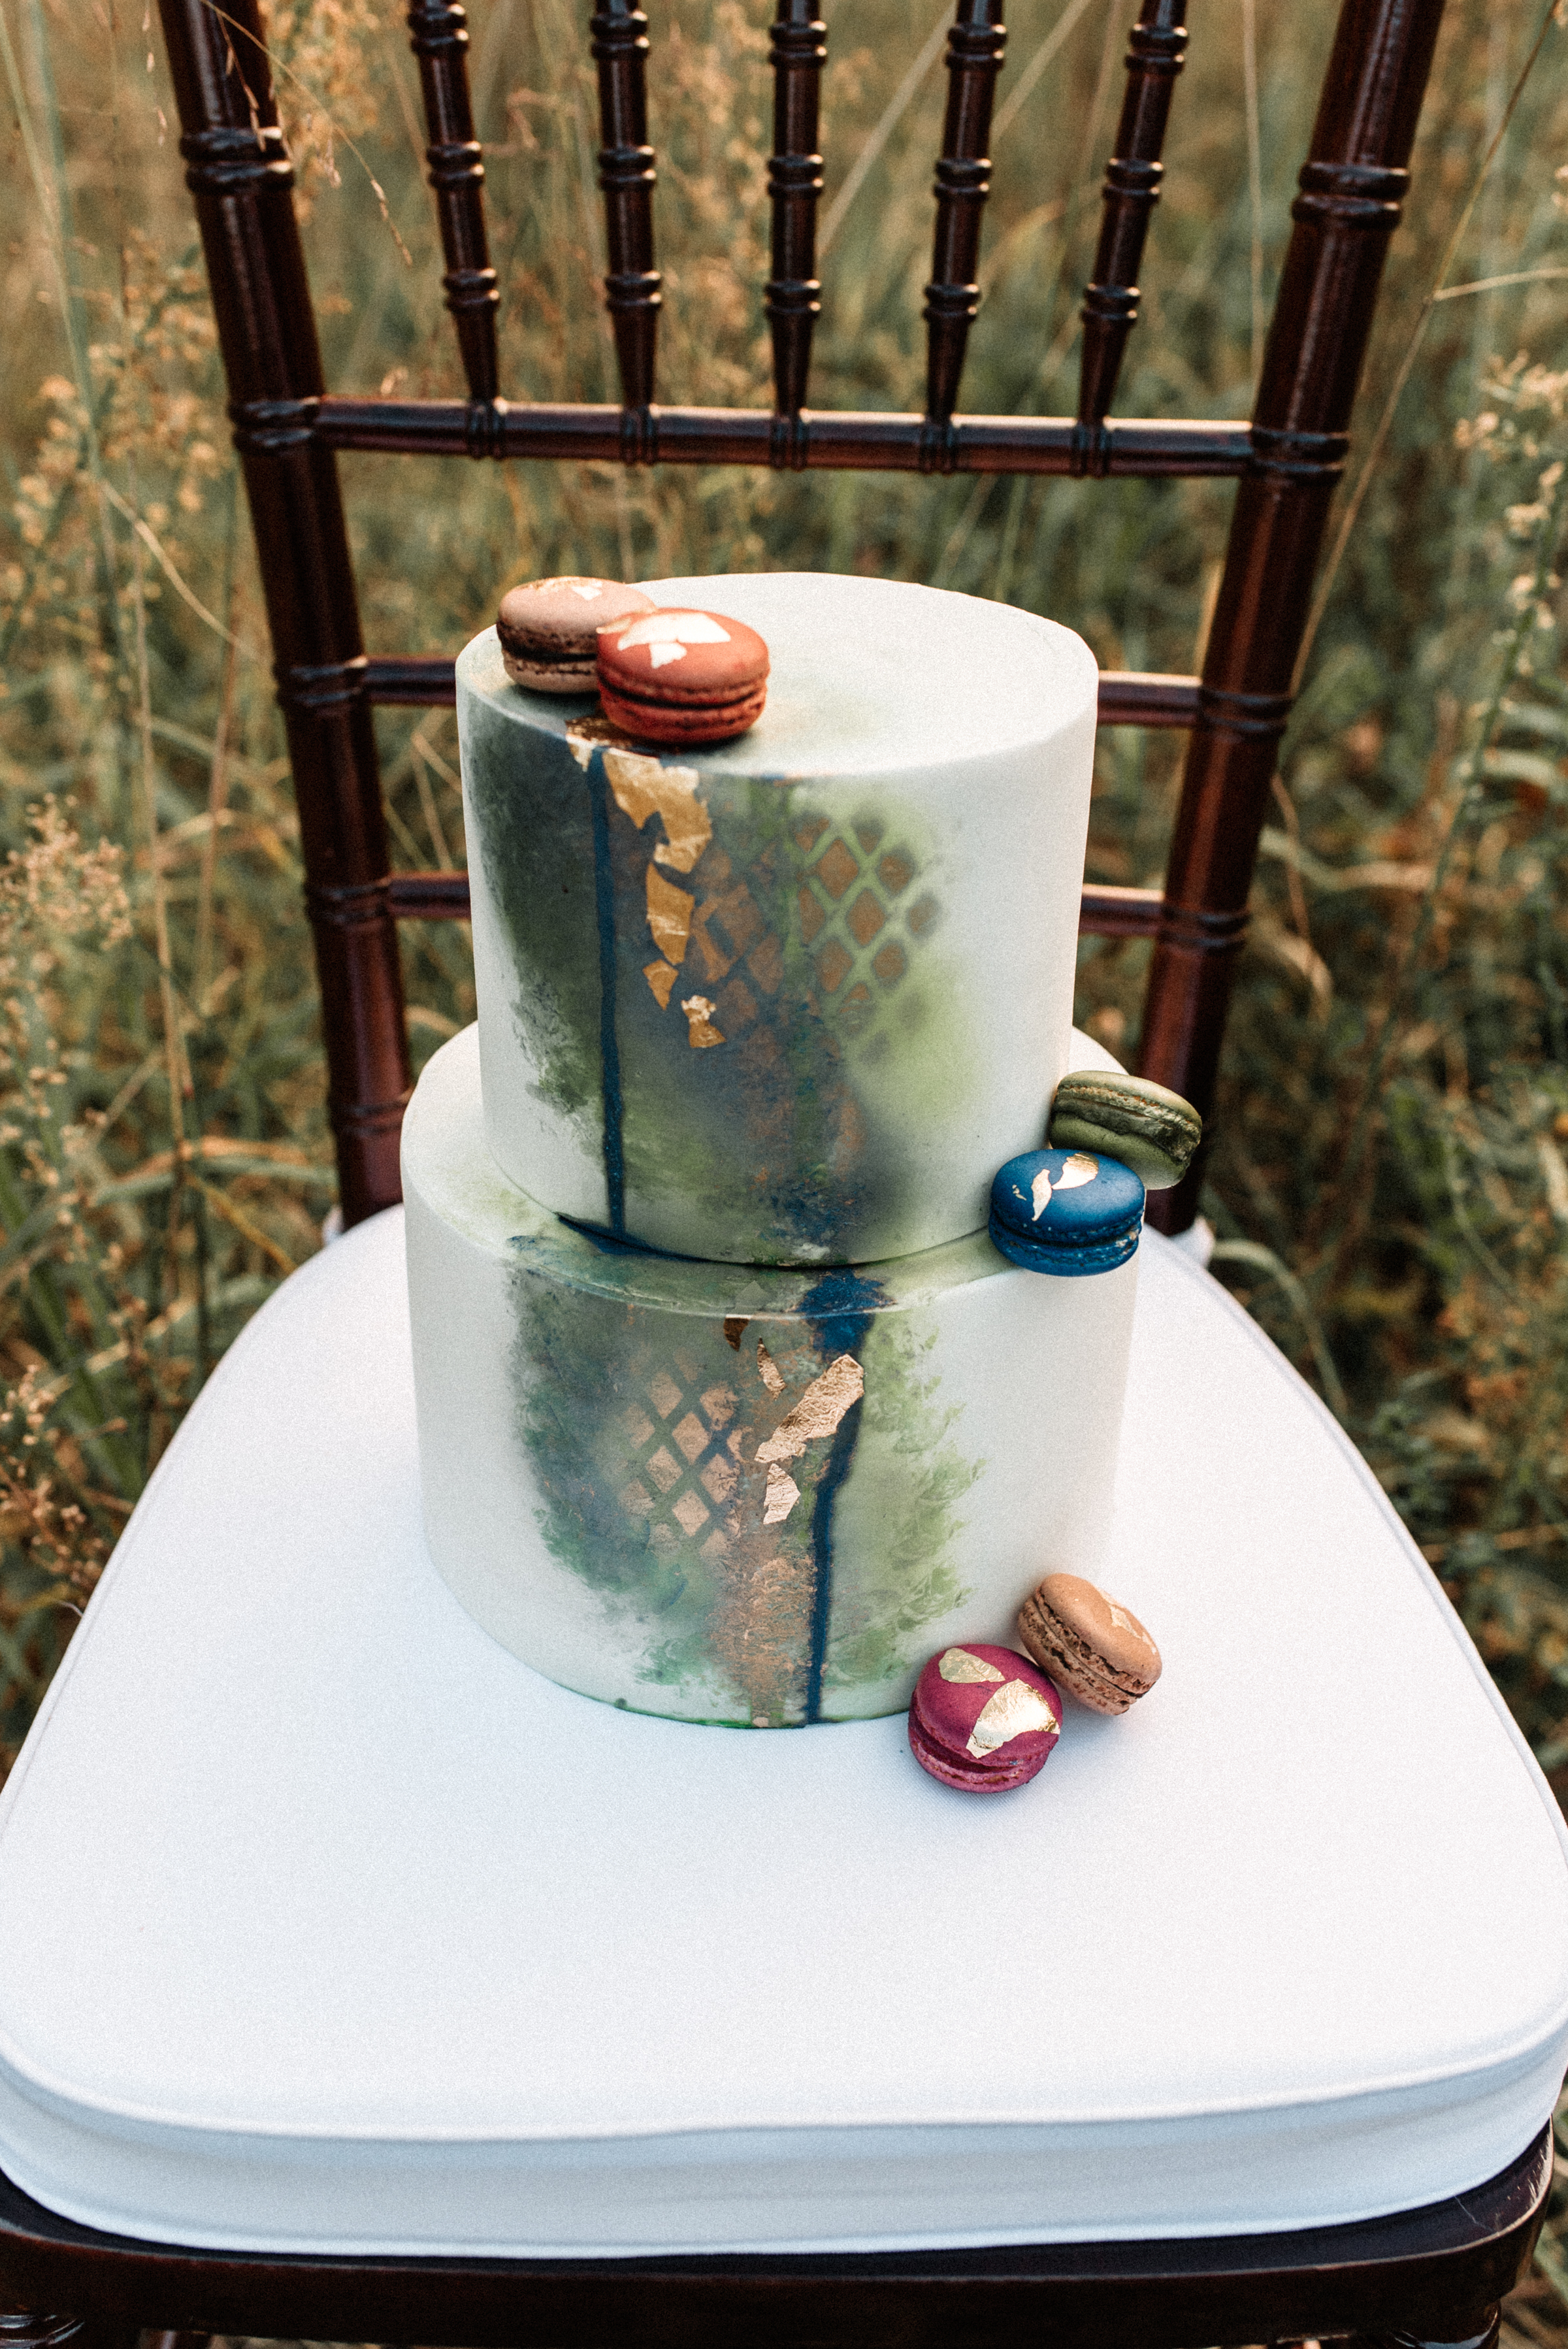 cake on chair 1.jpg